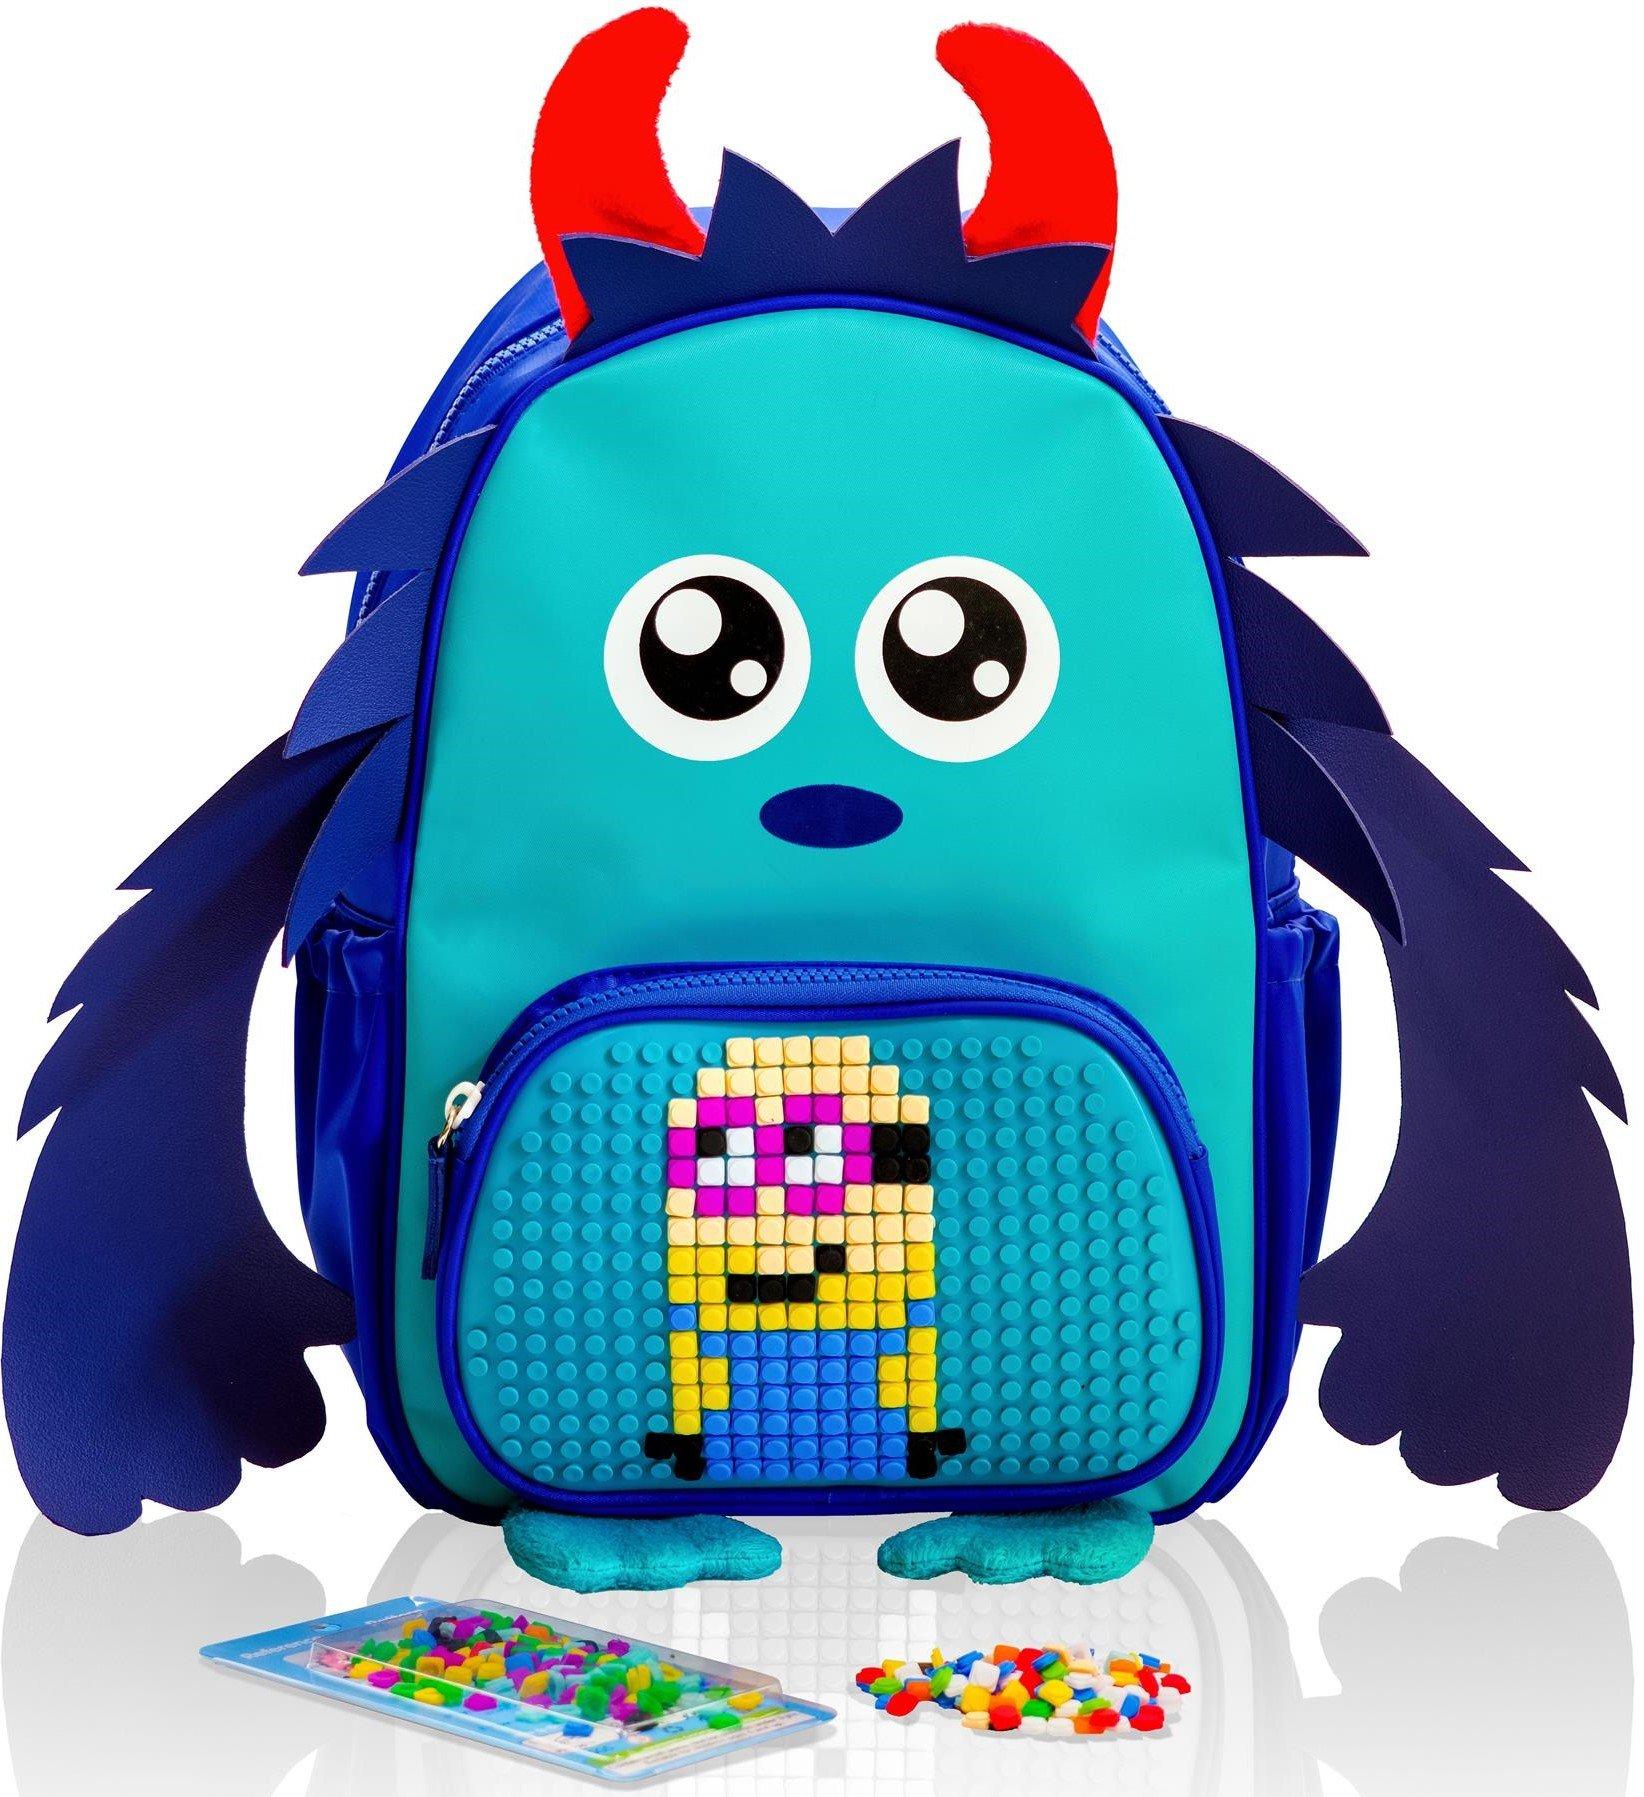 KIDS Backpack Blue Monster Customizable Pixel Art Front Pocket ...